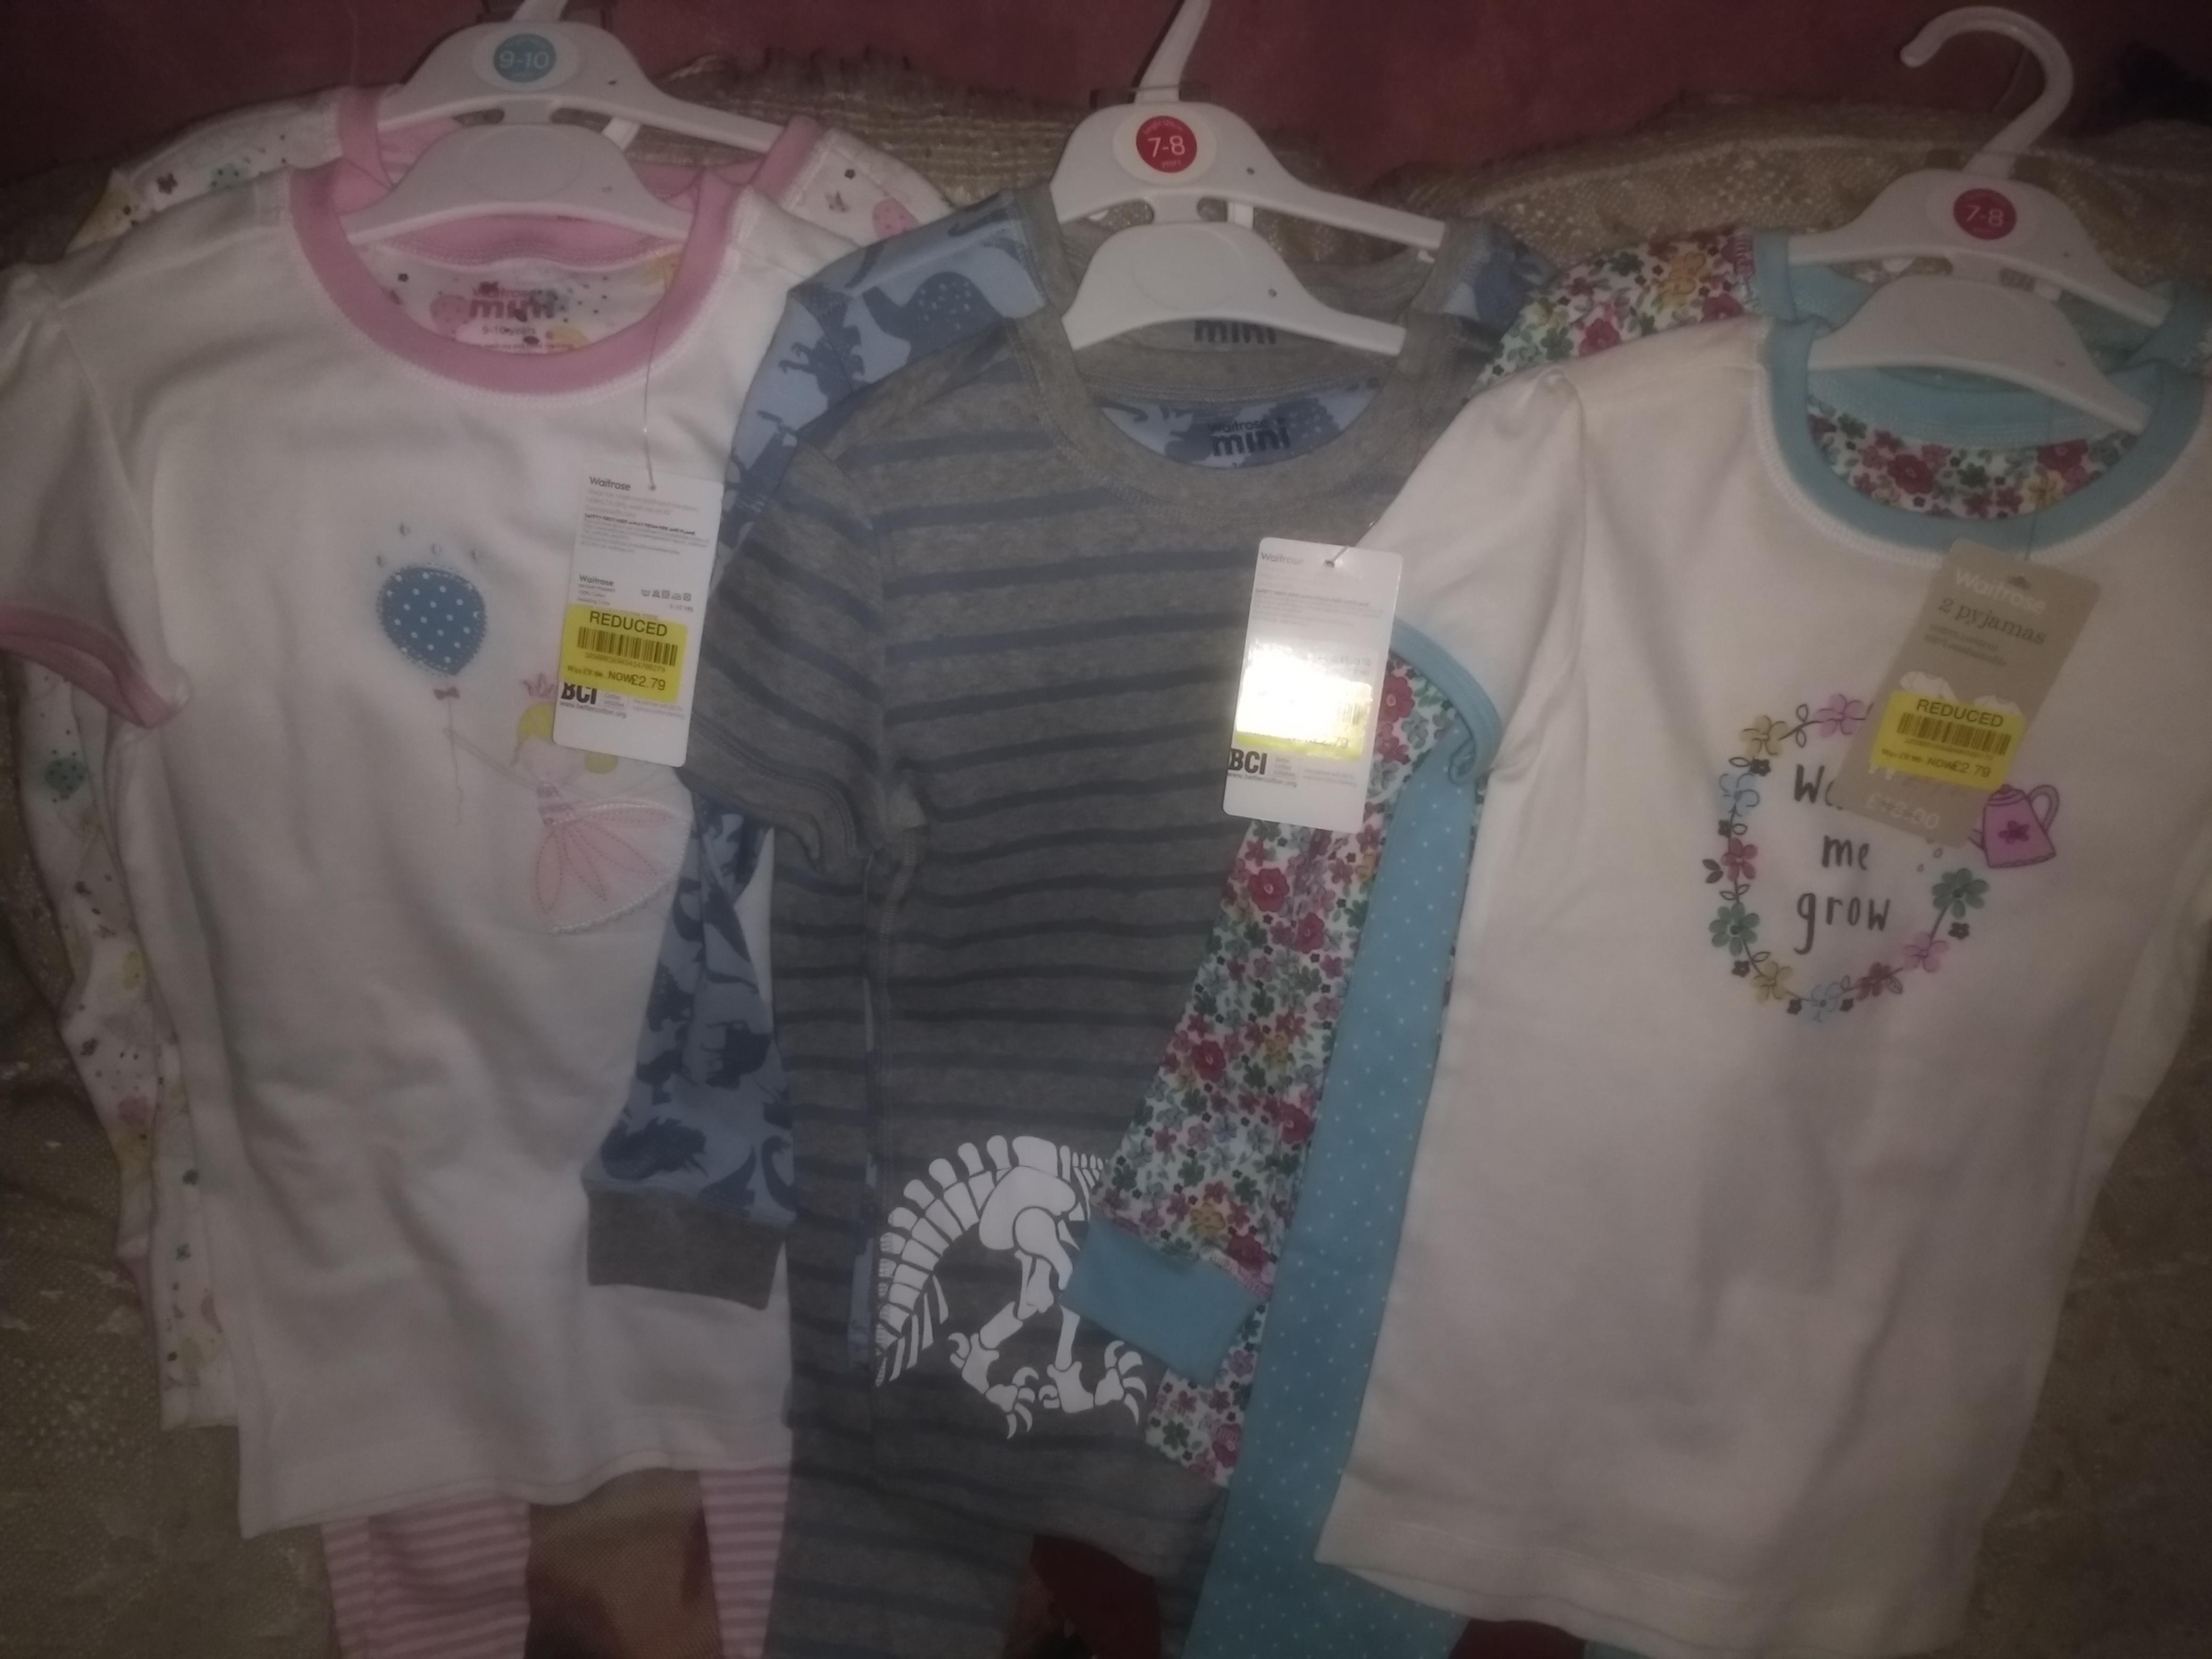 Children's clothing sale Waitrose - PJs reduced from £18 ro £2.79 - seen instore @ Sudbury